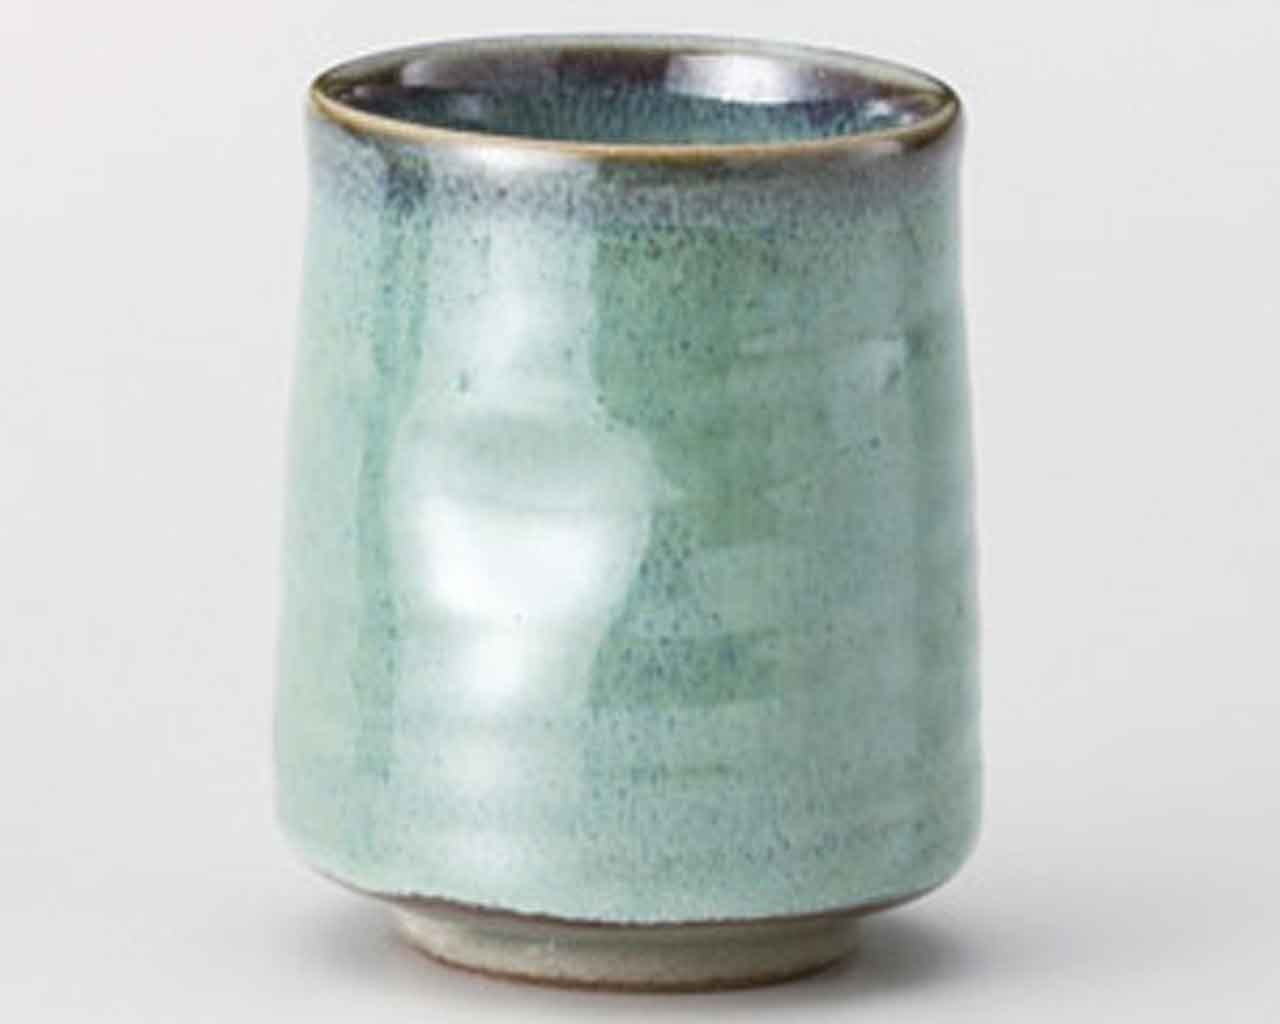 Hiwa Green 6.3cm Japanese Tea Cup Green porcelain Made in Japan watou.asia